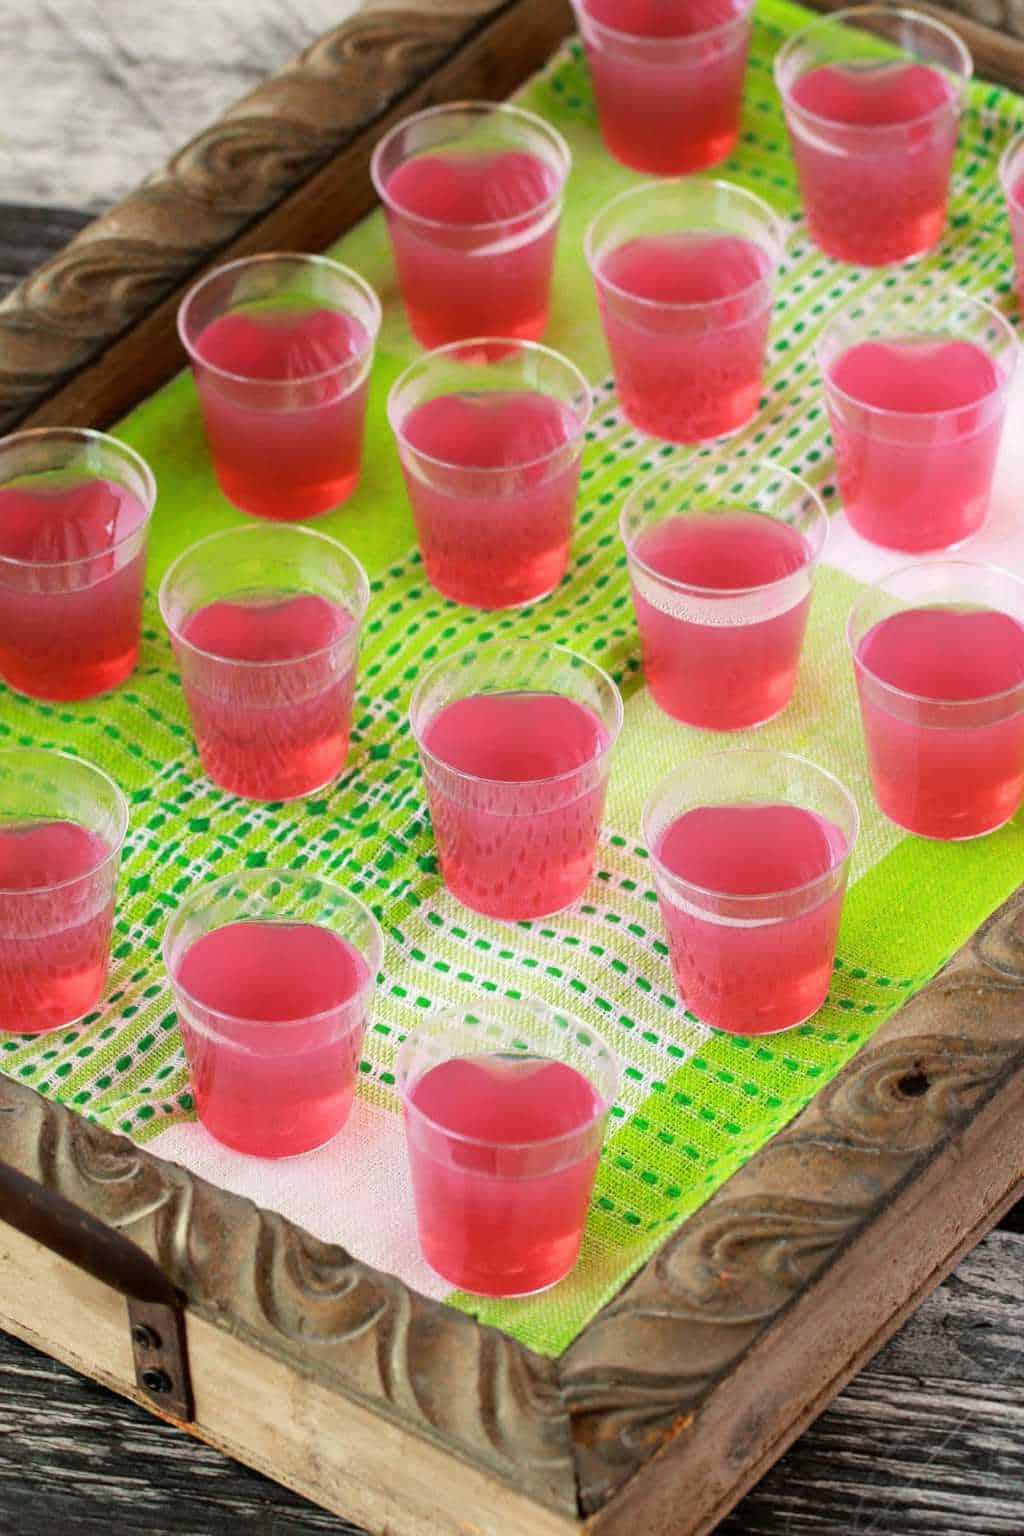 These festive boozy vegan jello shots are perfect for parties! They're colorful, fun and super easy to make! Top with vegan whipped cream! #vegan #lovingitvegan #jelloshots #drinks #glutenfree #dairyfree   lovingitvegan.com